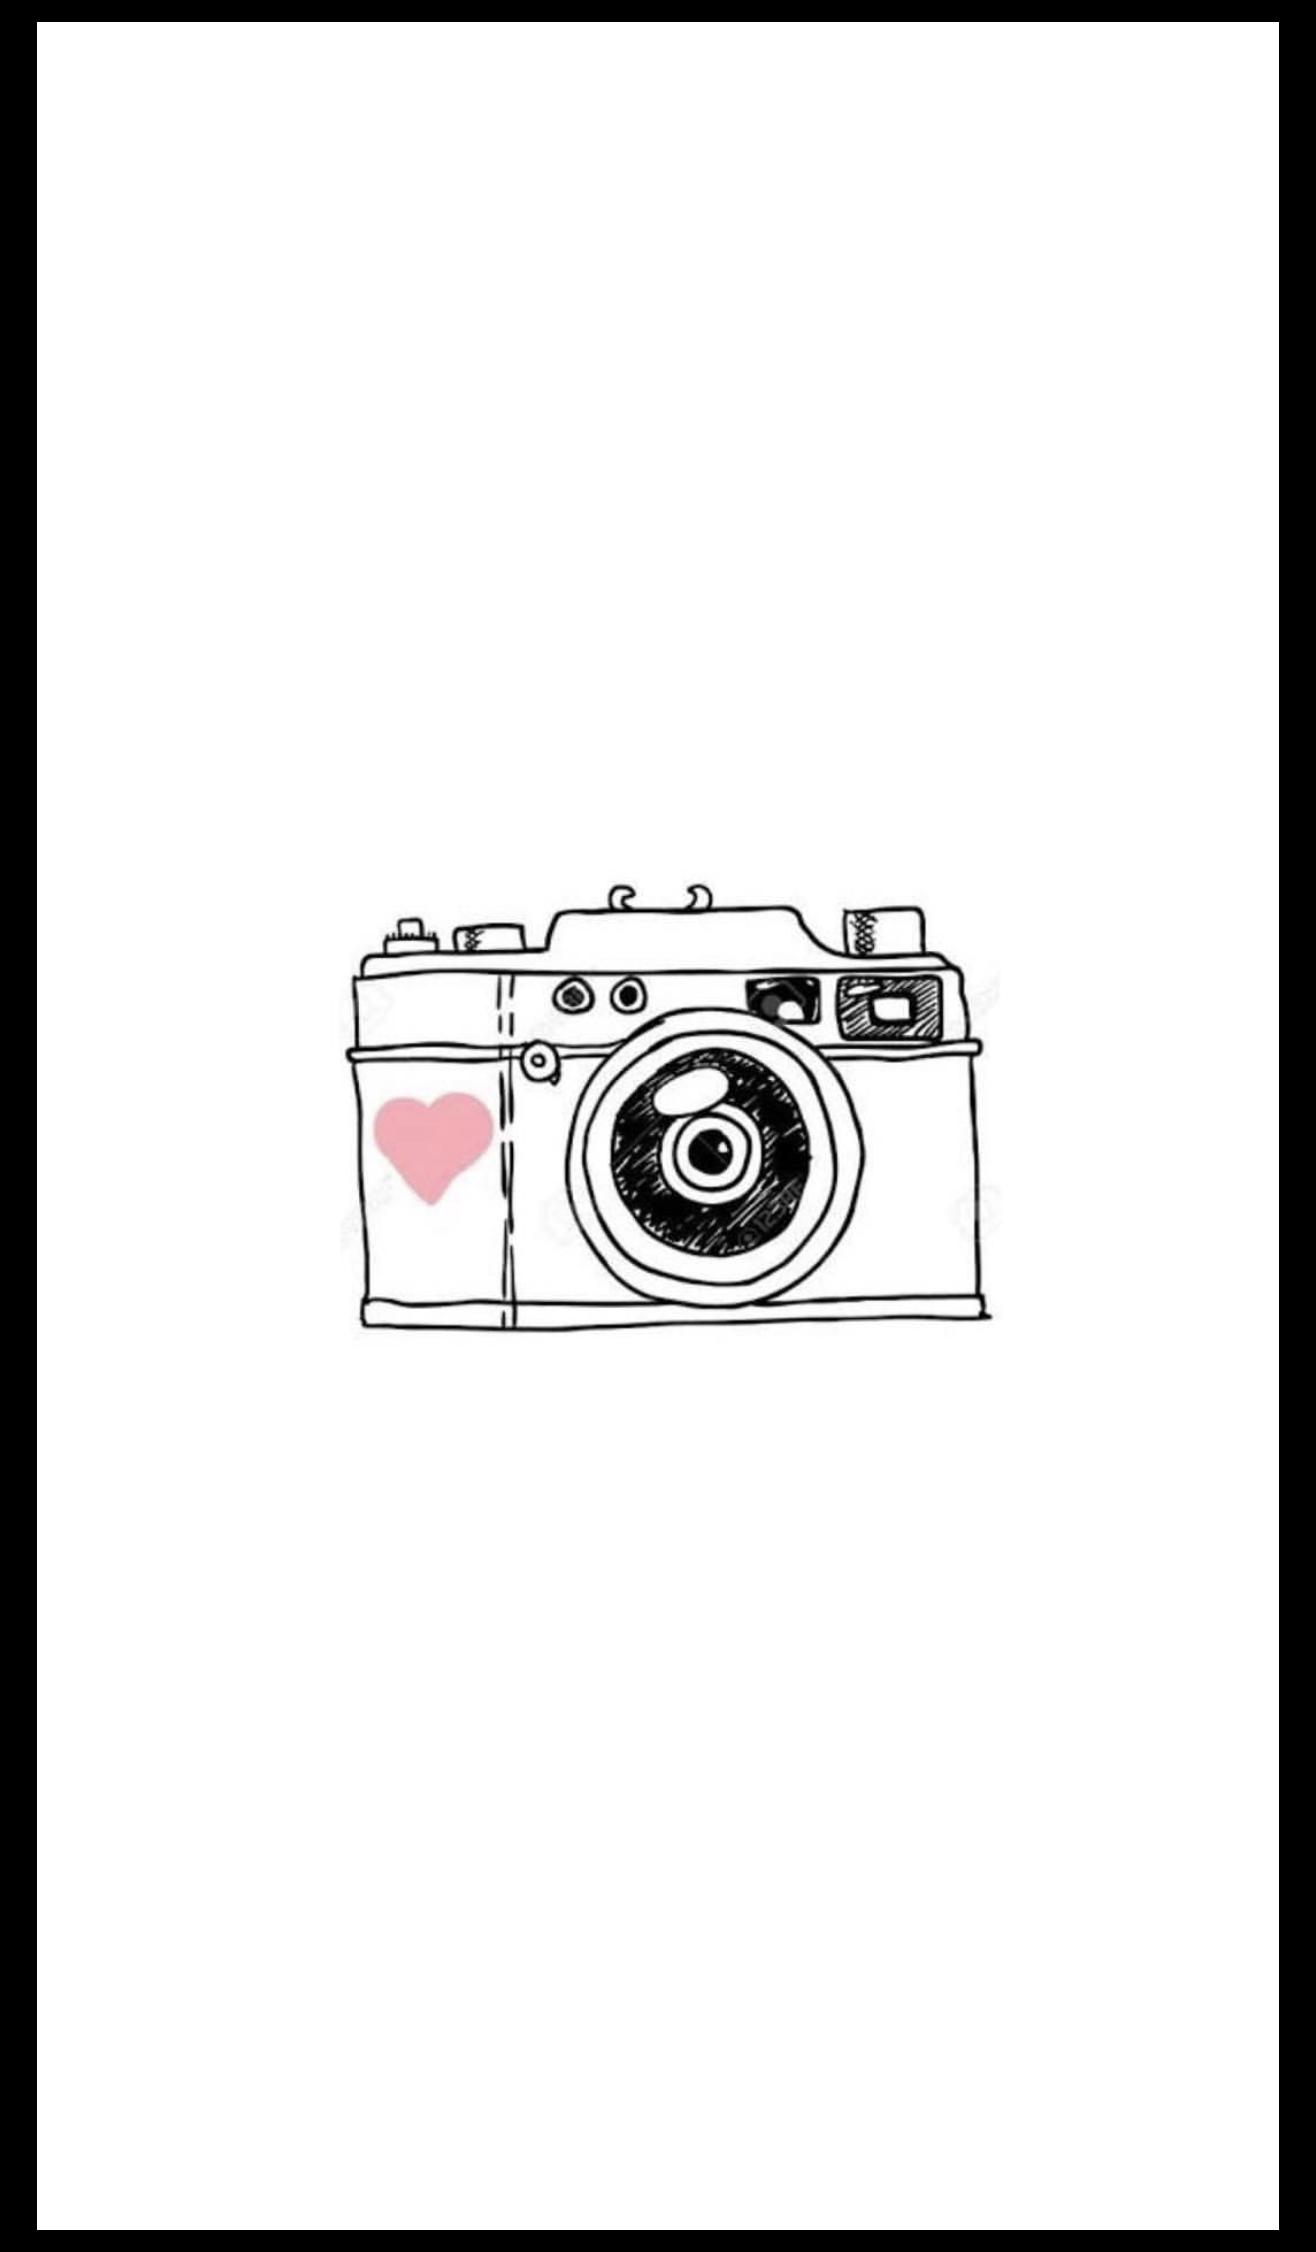 Camera Aesthetic Icon Cameraaestheticicon In 2021 Instagram Highlight Icons Camera Drawing Camera Logo Vintage